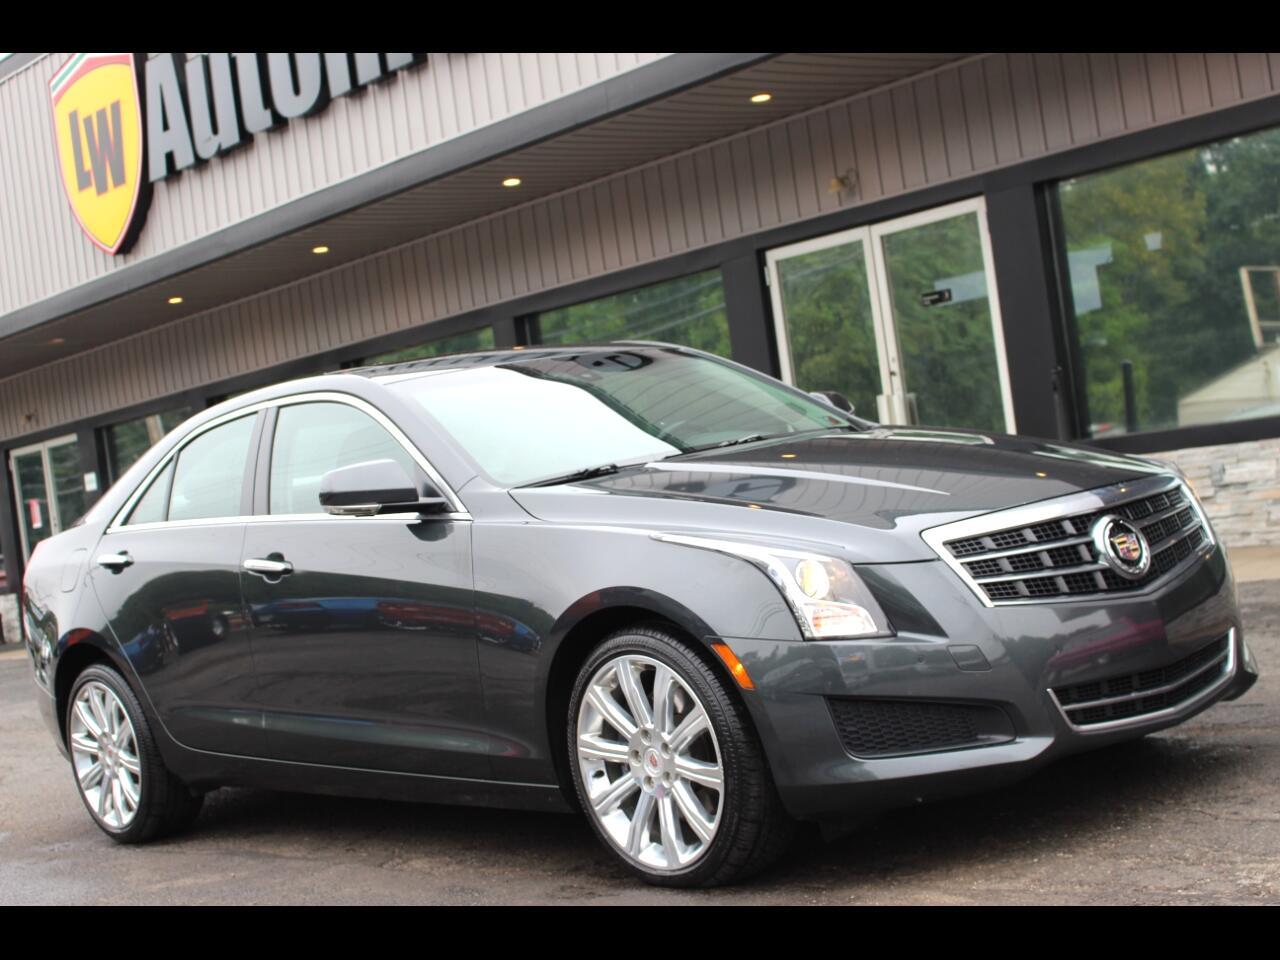 Cadillac ATS 4dr Sdn 3.6L Luxury AWD 2014